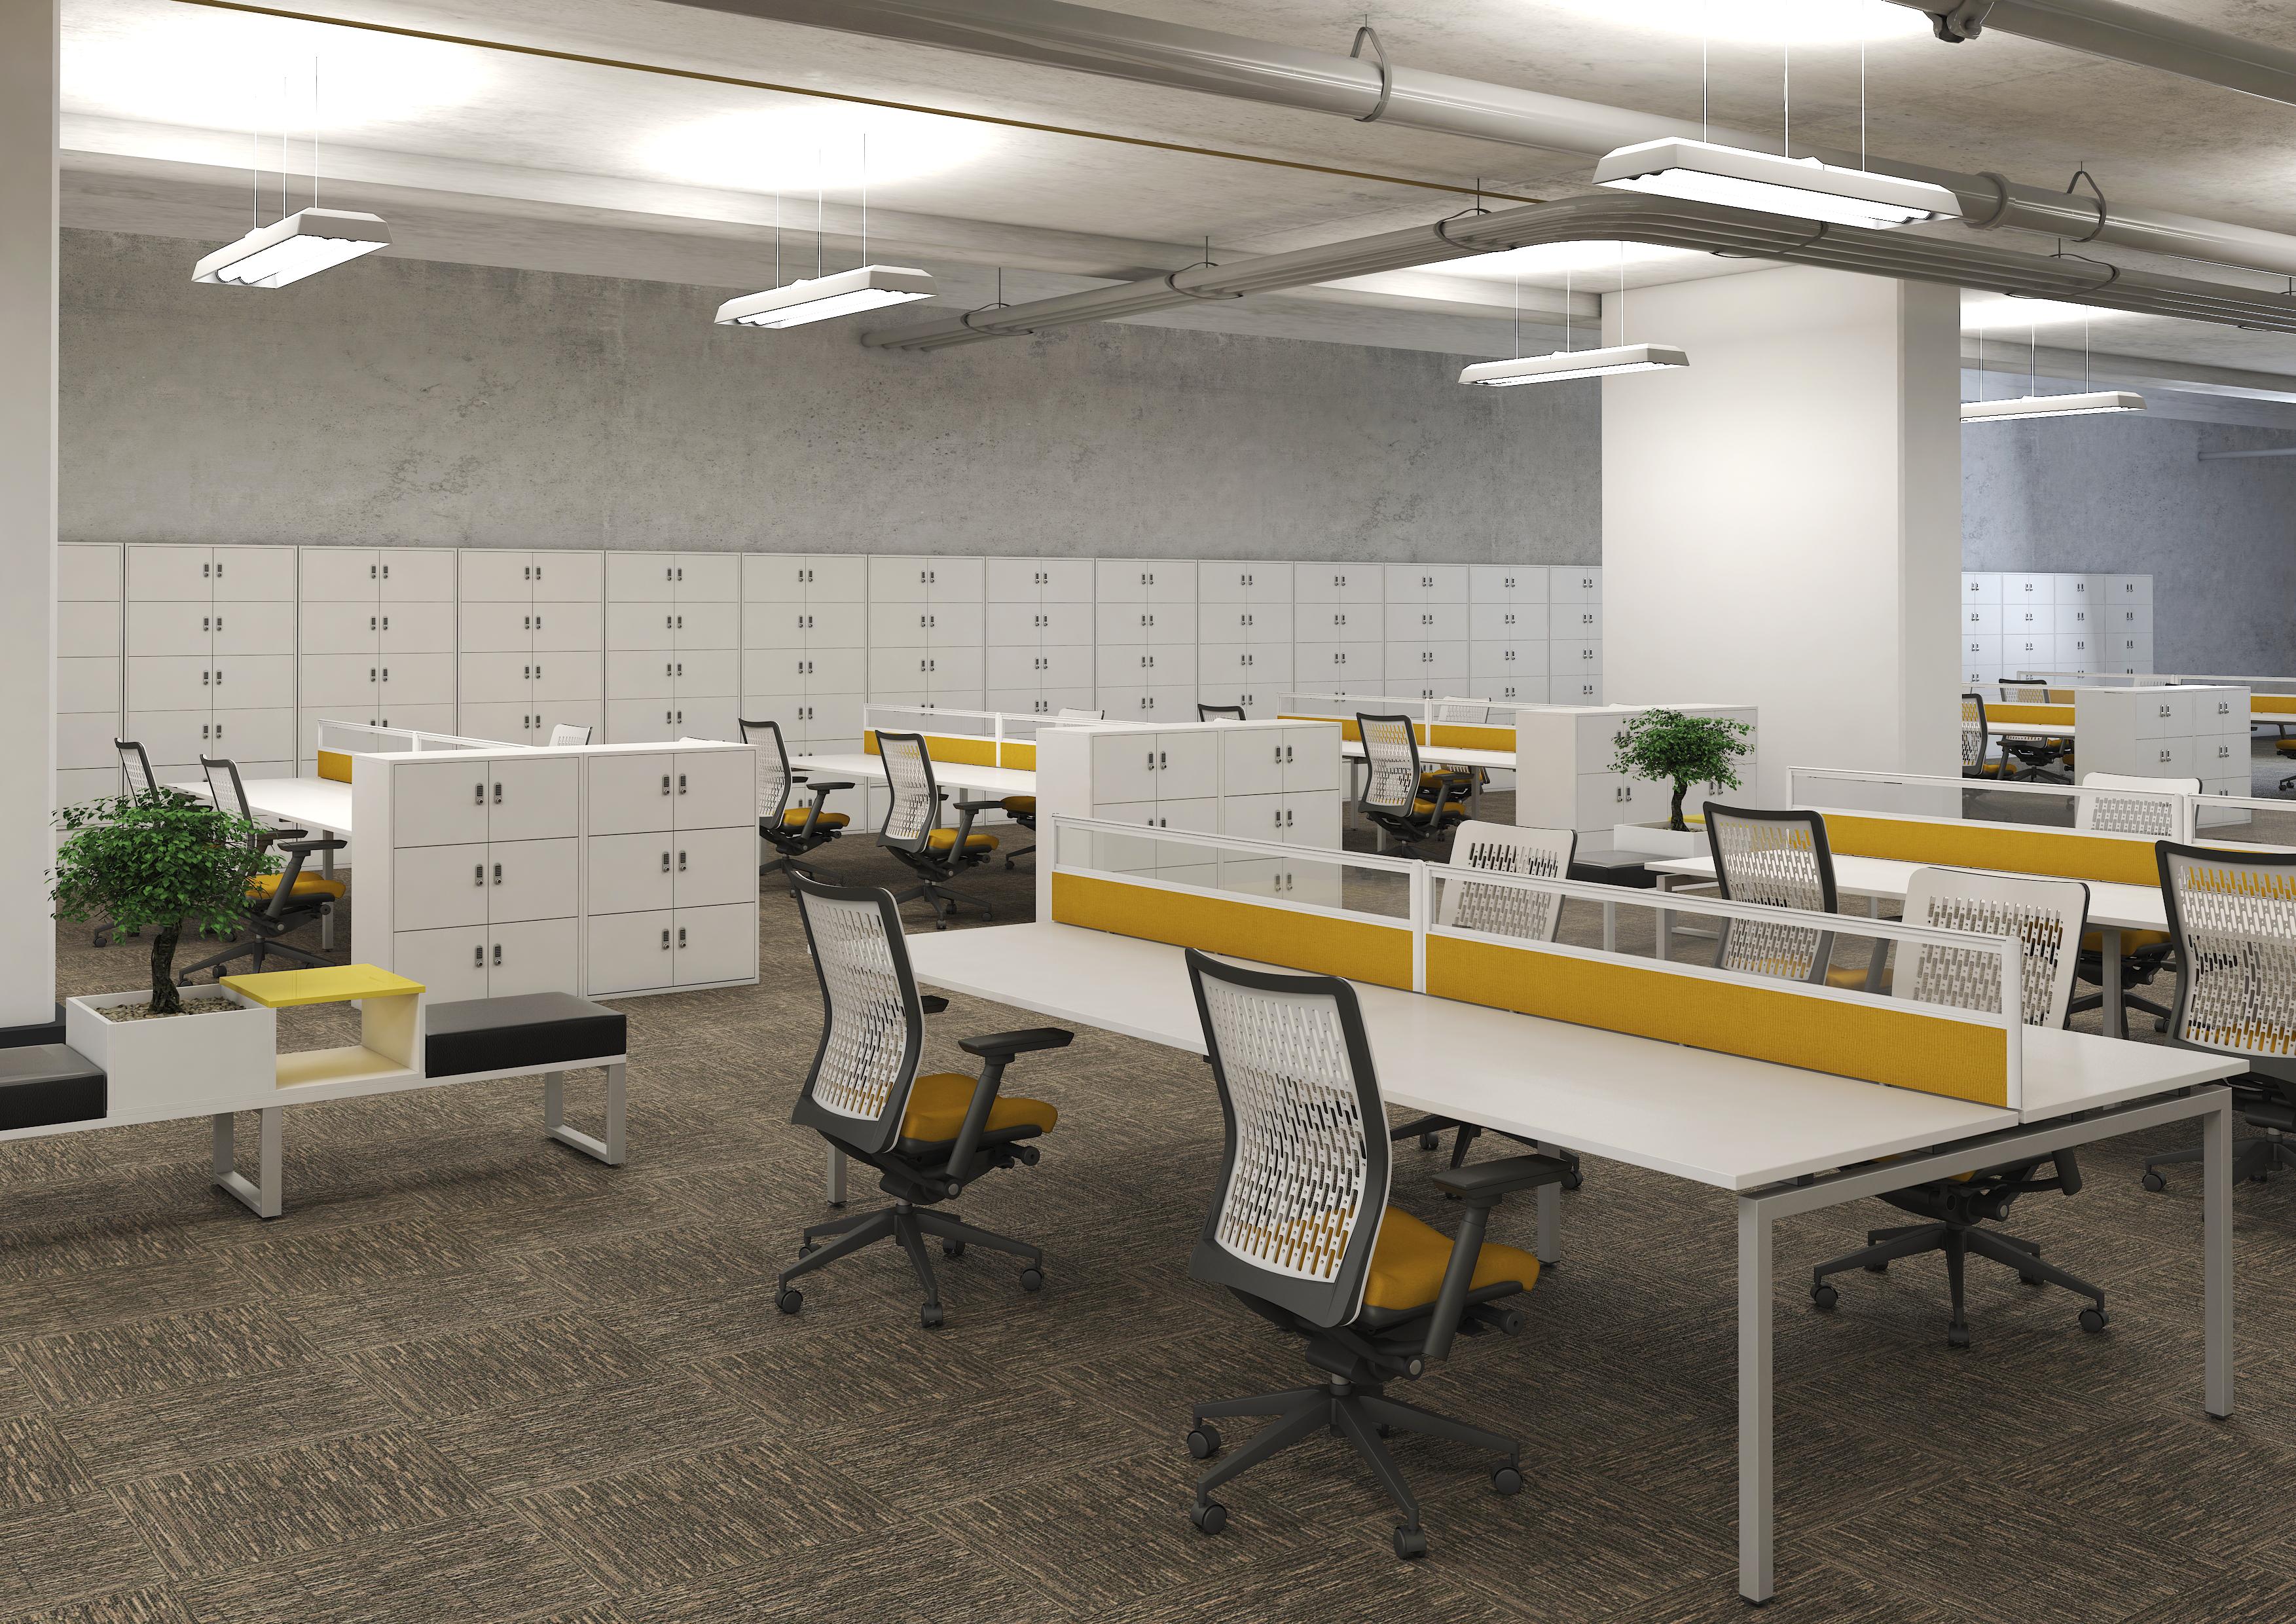 Office furniture leeds - Office Furniture Leeds 59